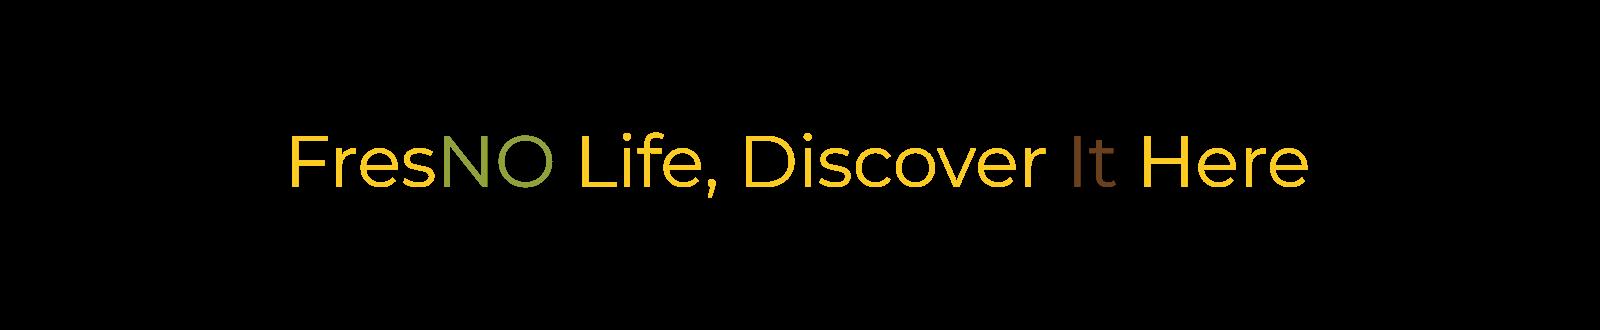 NoLife ad banner